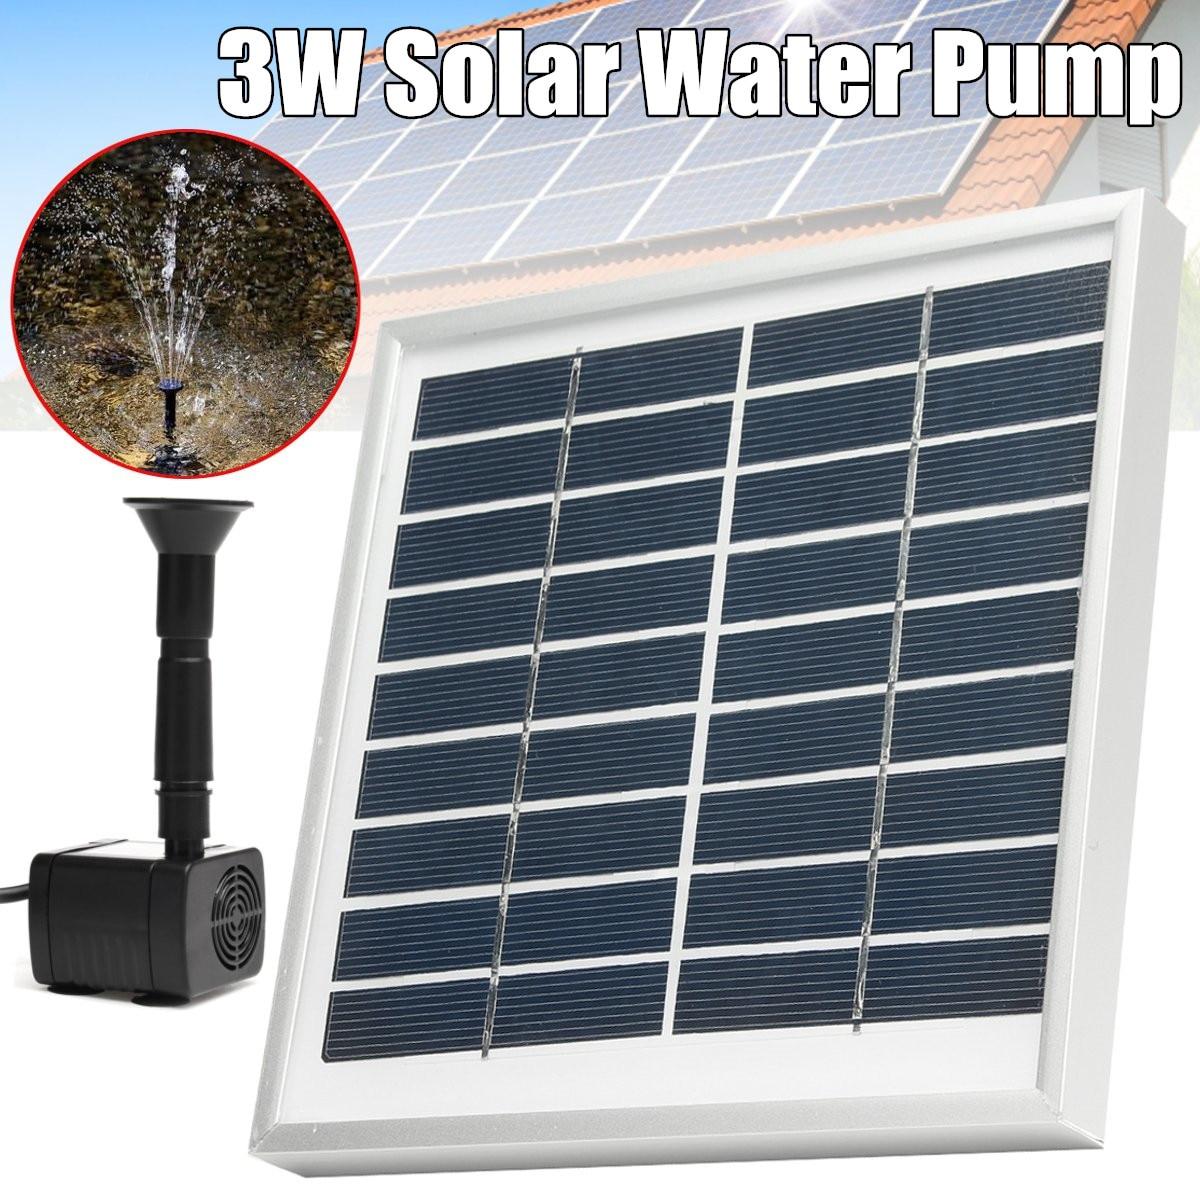 3W Solar Pump,DC Pump Brushless Motor Water Pump,Aquarium Submersible,Rockery Fountain Garden solar pumps цены